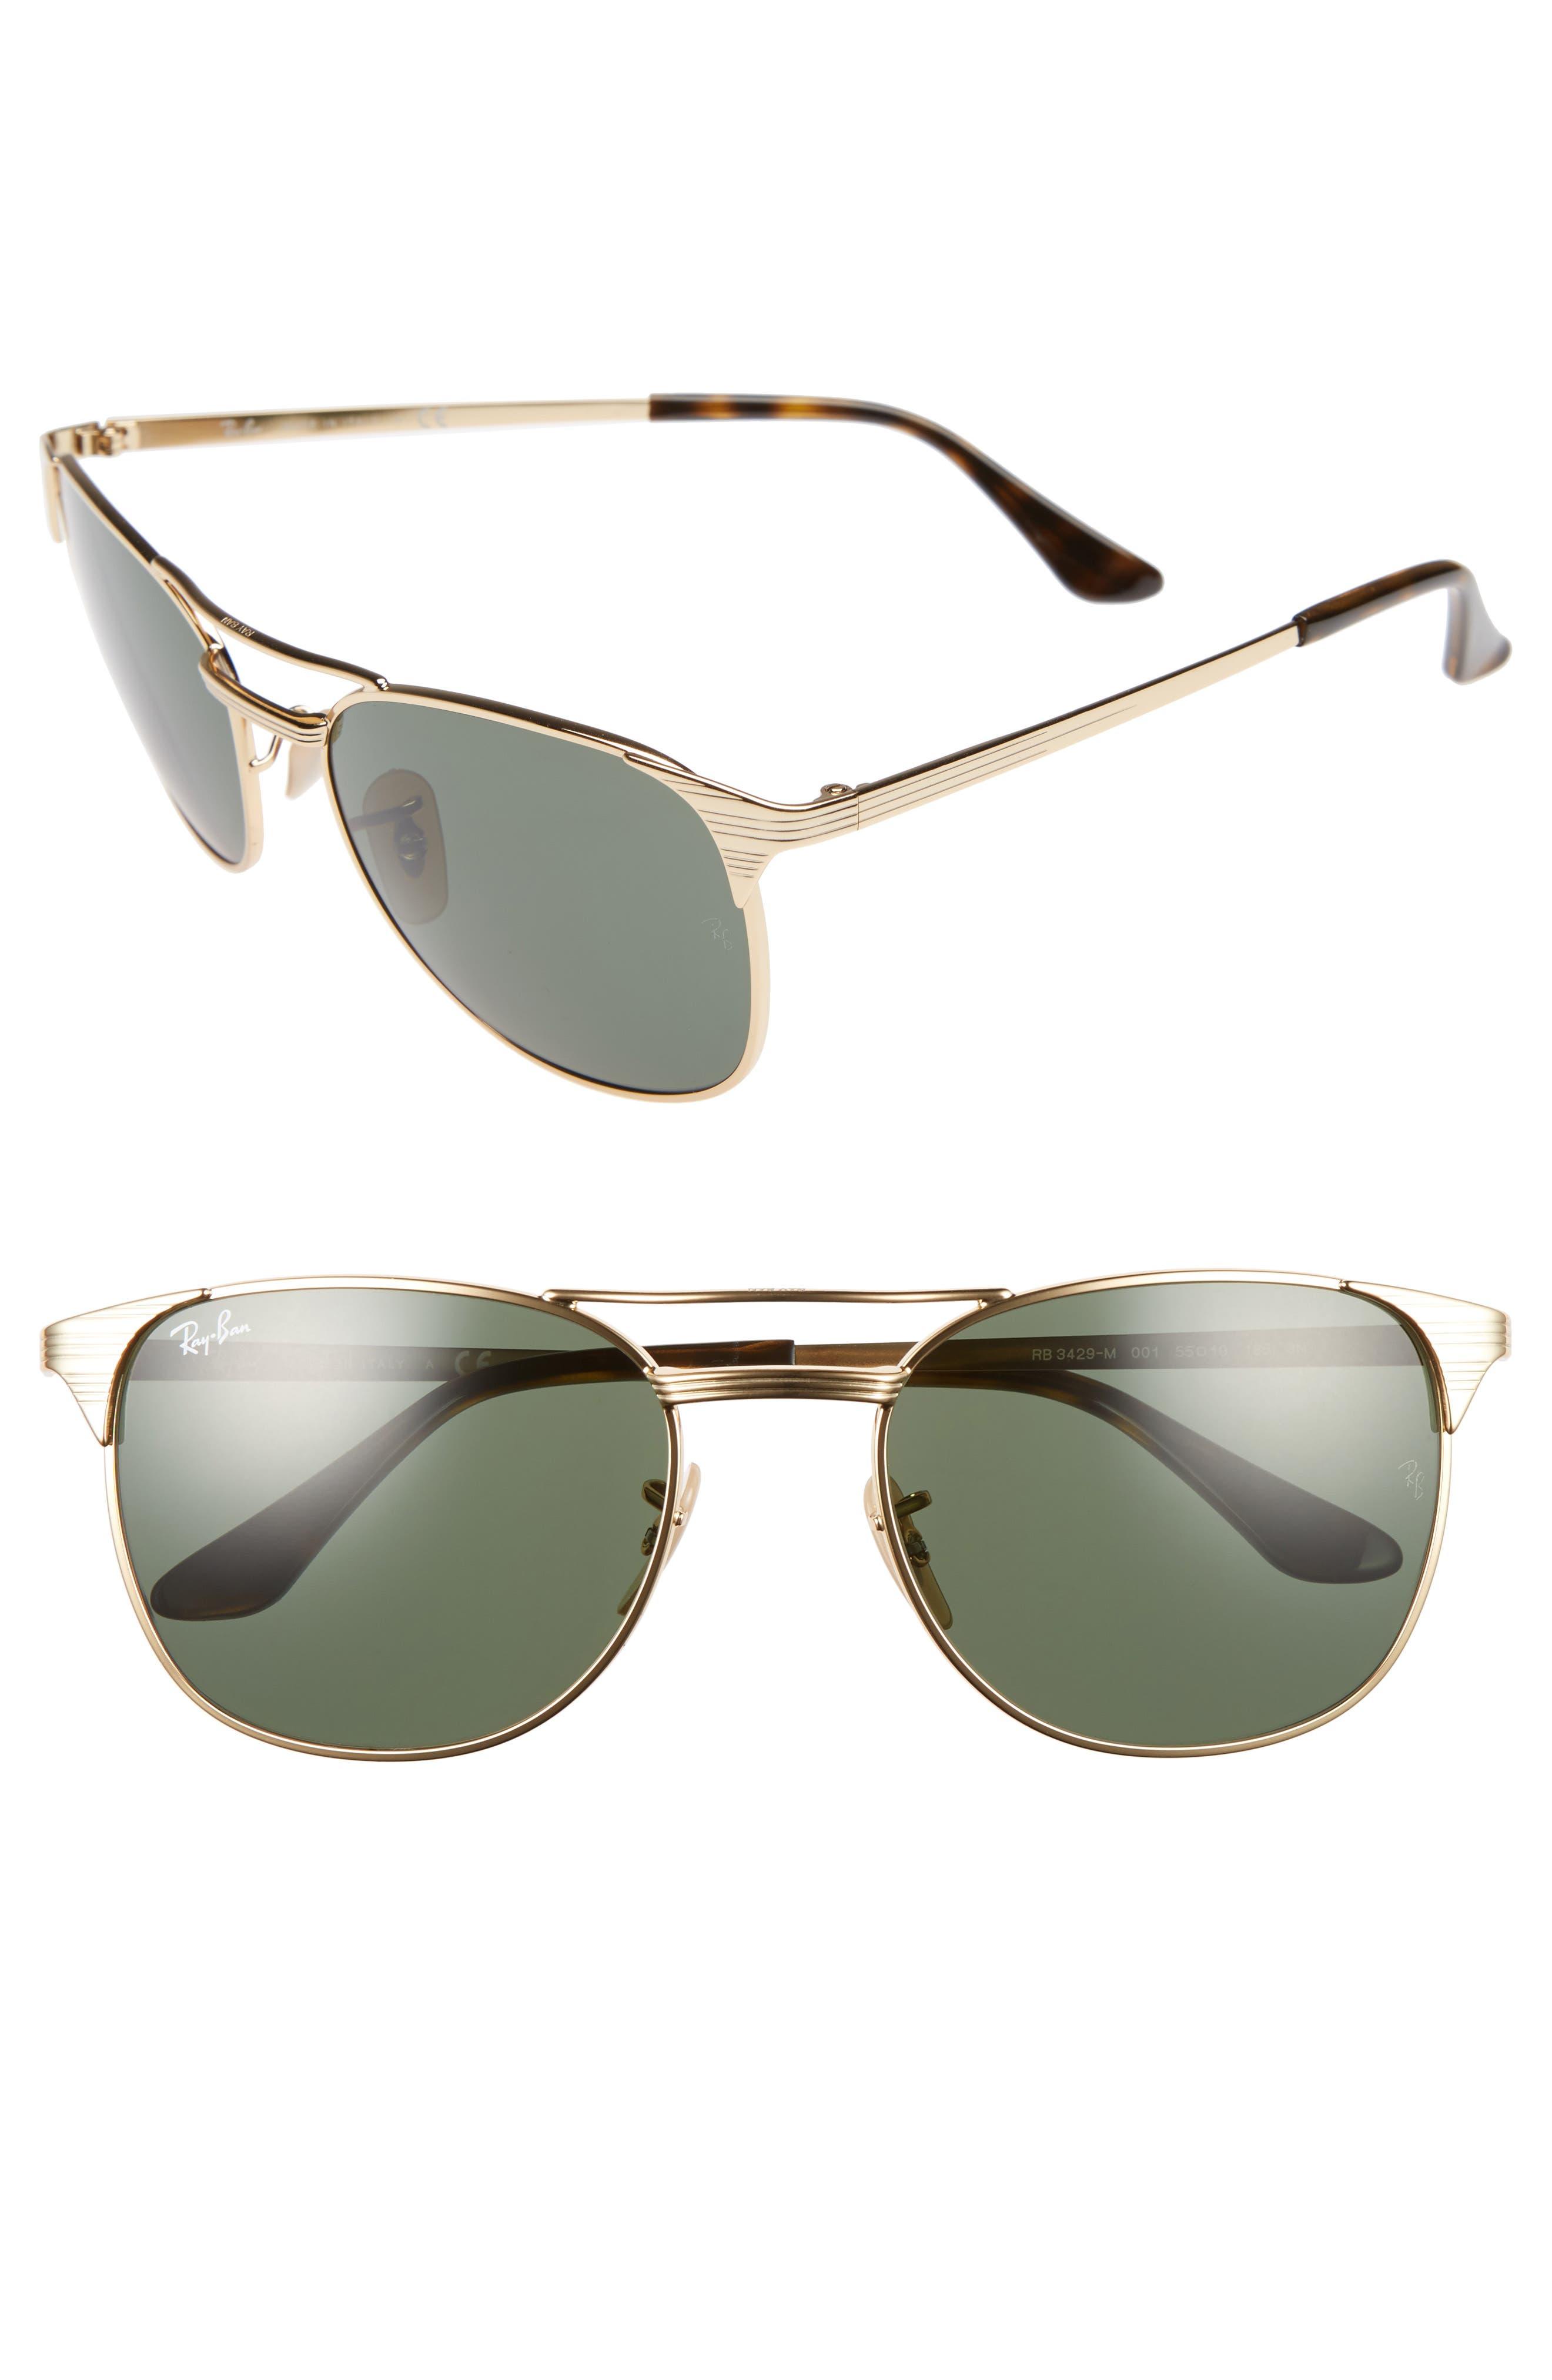 RAY-BAN Standard Icons Signet 55mm Retro Sunglasses